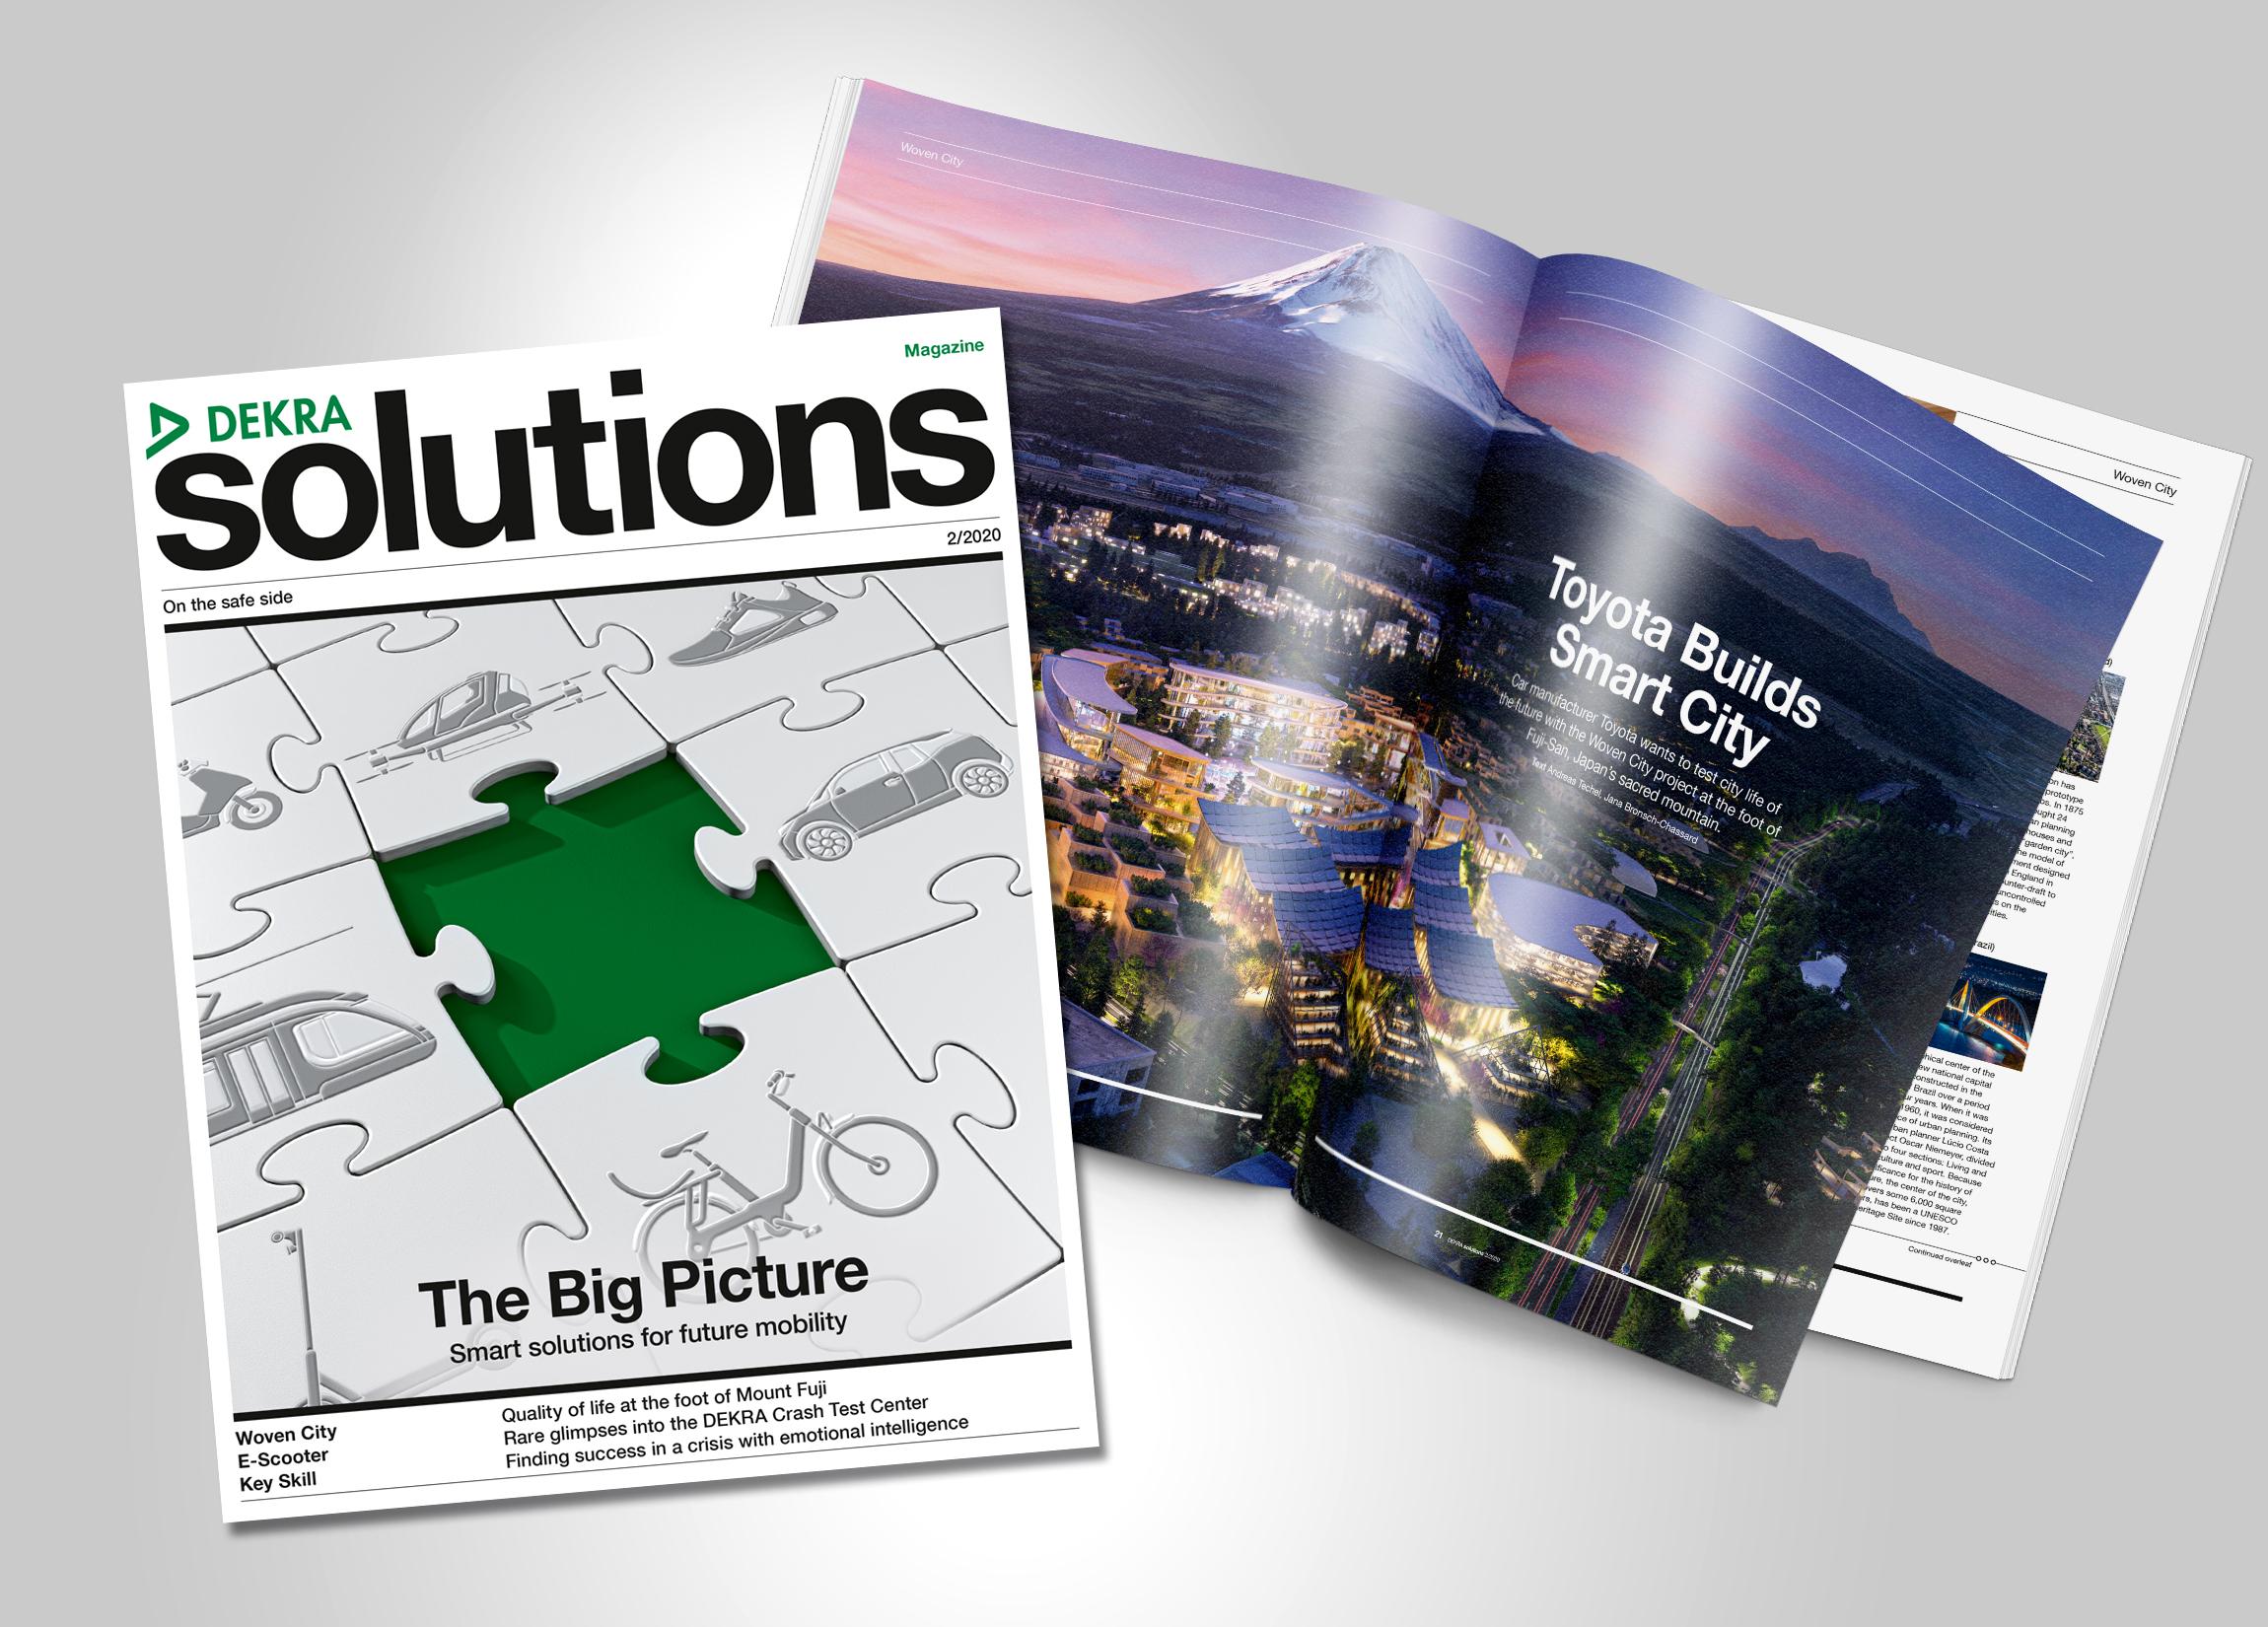 Titel DEKRA solutions 2/2020 Photo: DEKRA